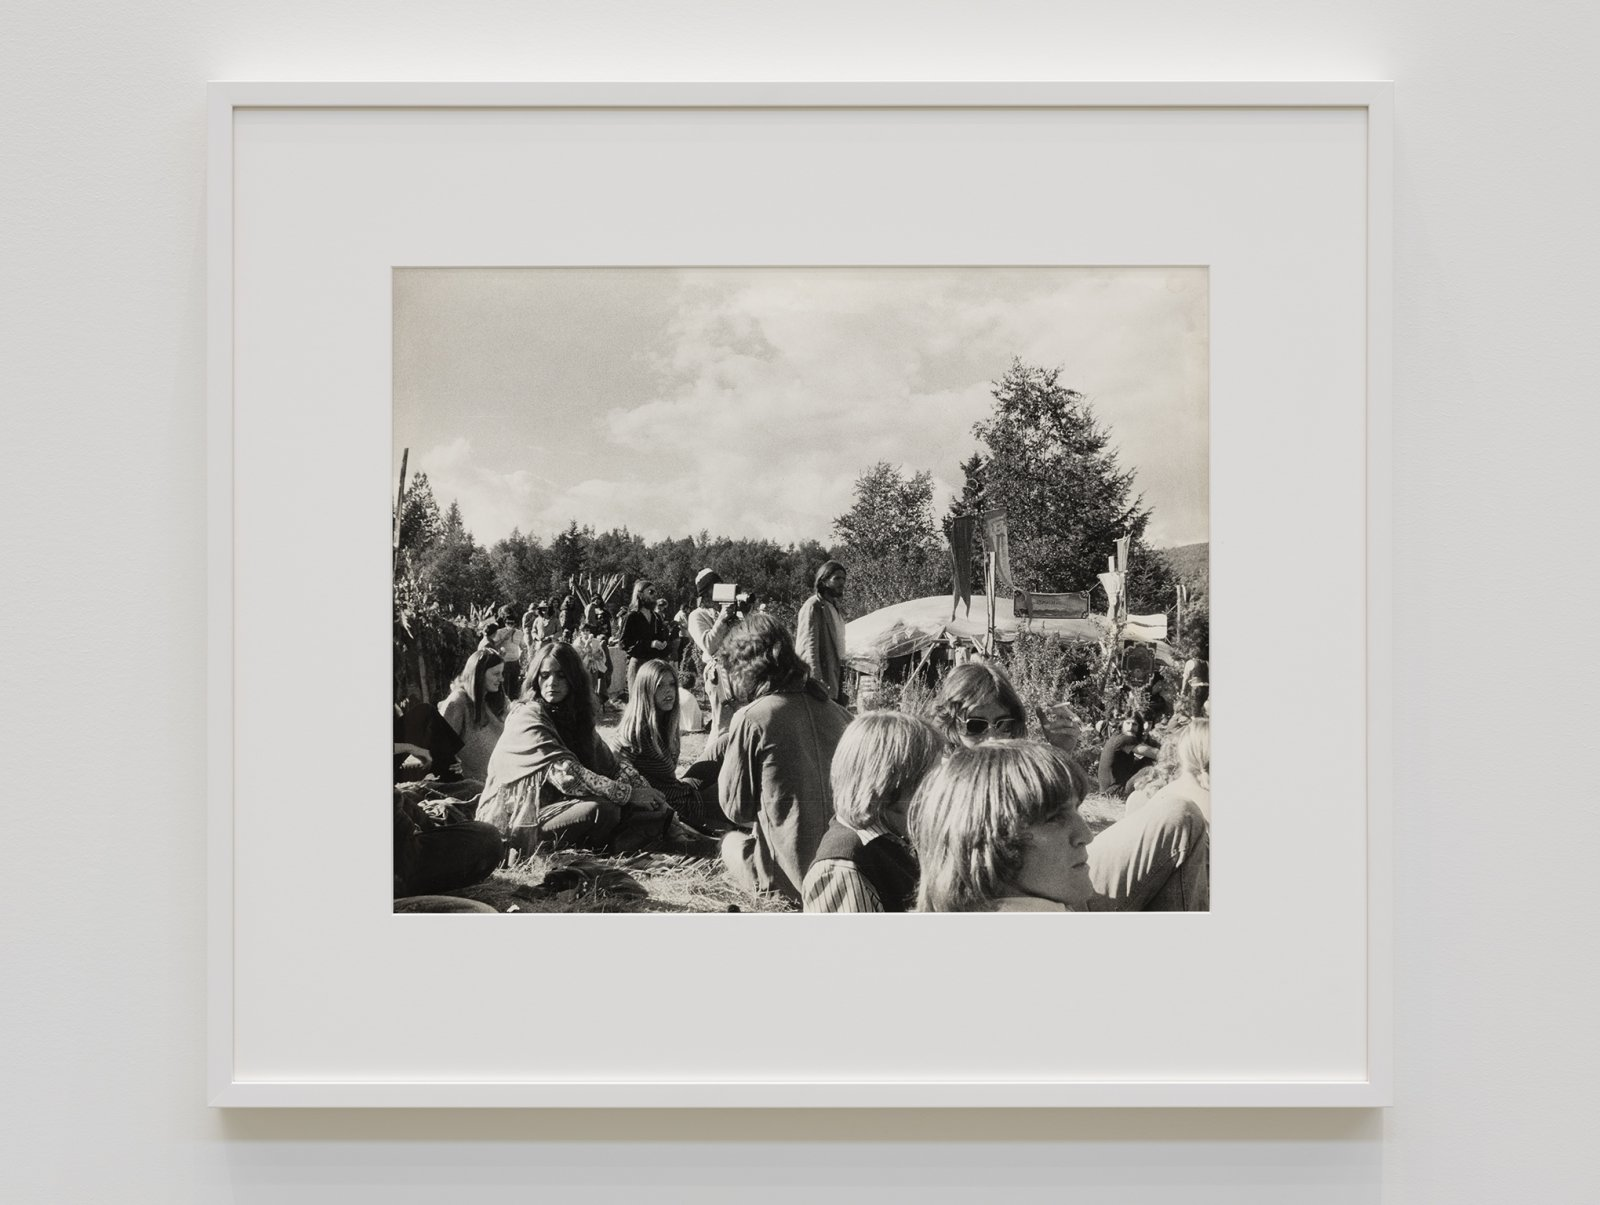 Ian Wallace, At the Pleasure Faire, 1971, silver gelatin print, 25 x 29 in. (62 x 72 cm)